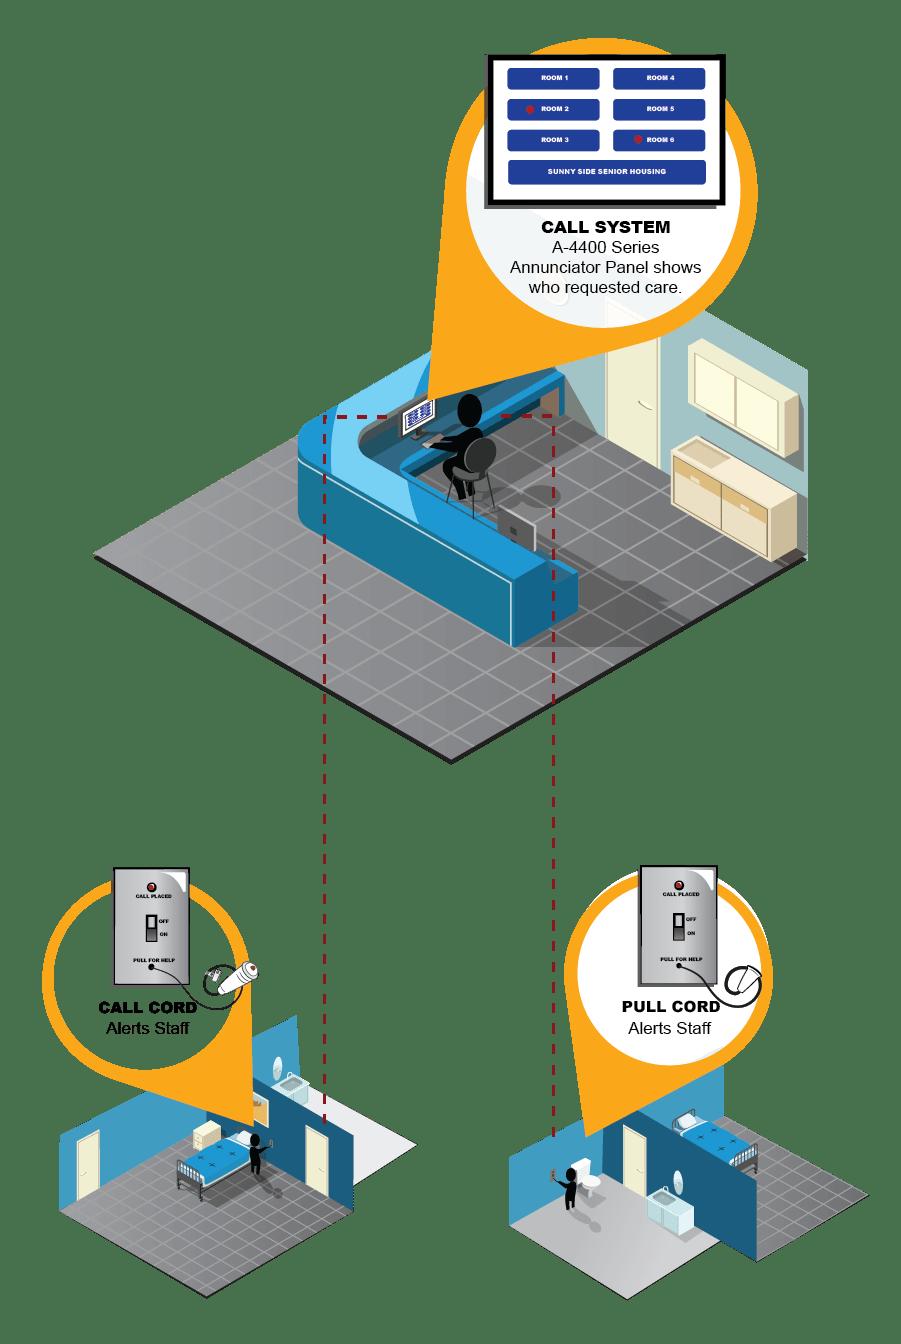 hight resolution of cornell nurse call system diagram cornell nurse call system diagram